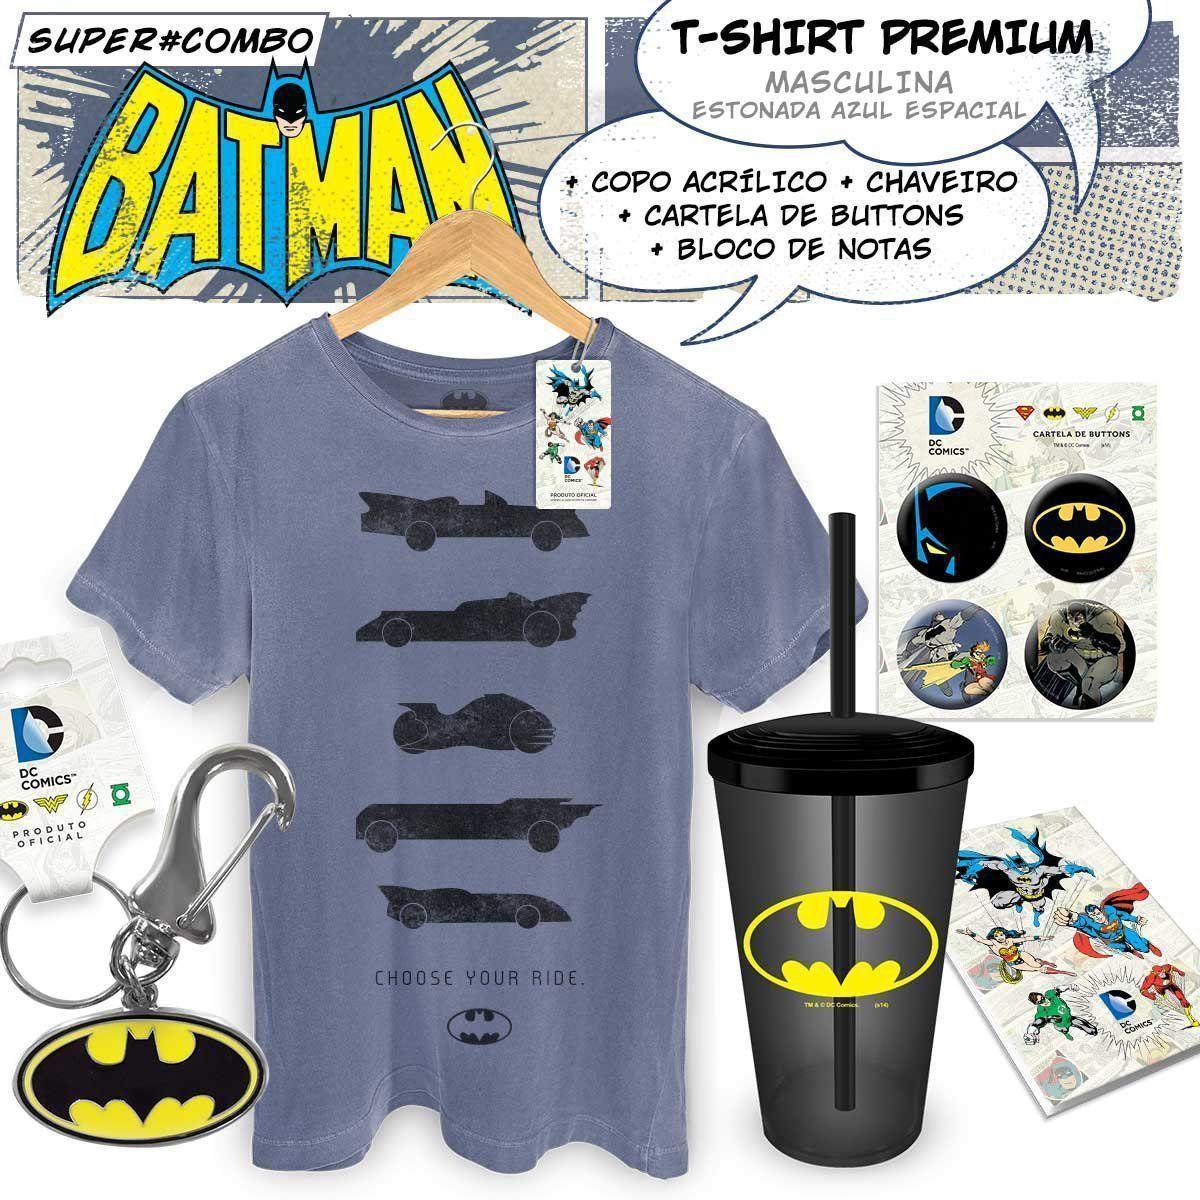 Super Combo Masculino Batman Choose Your Ride